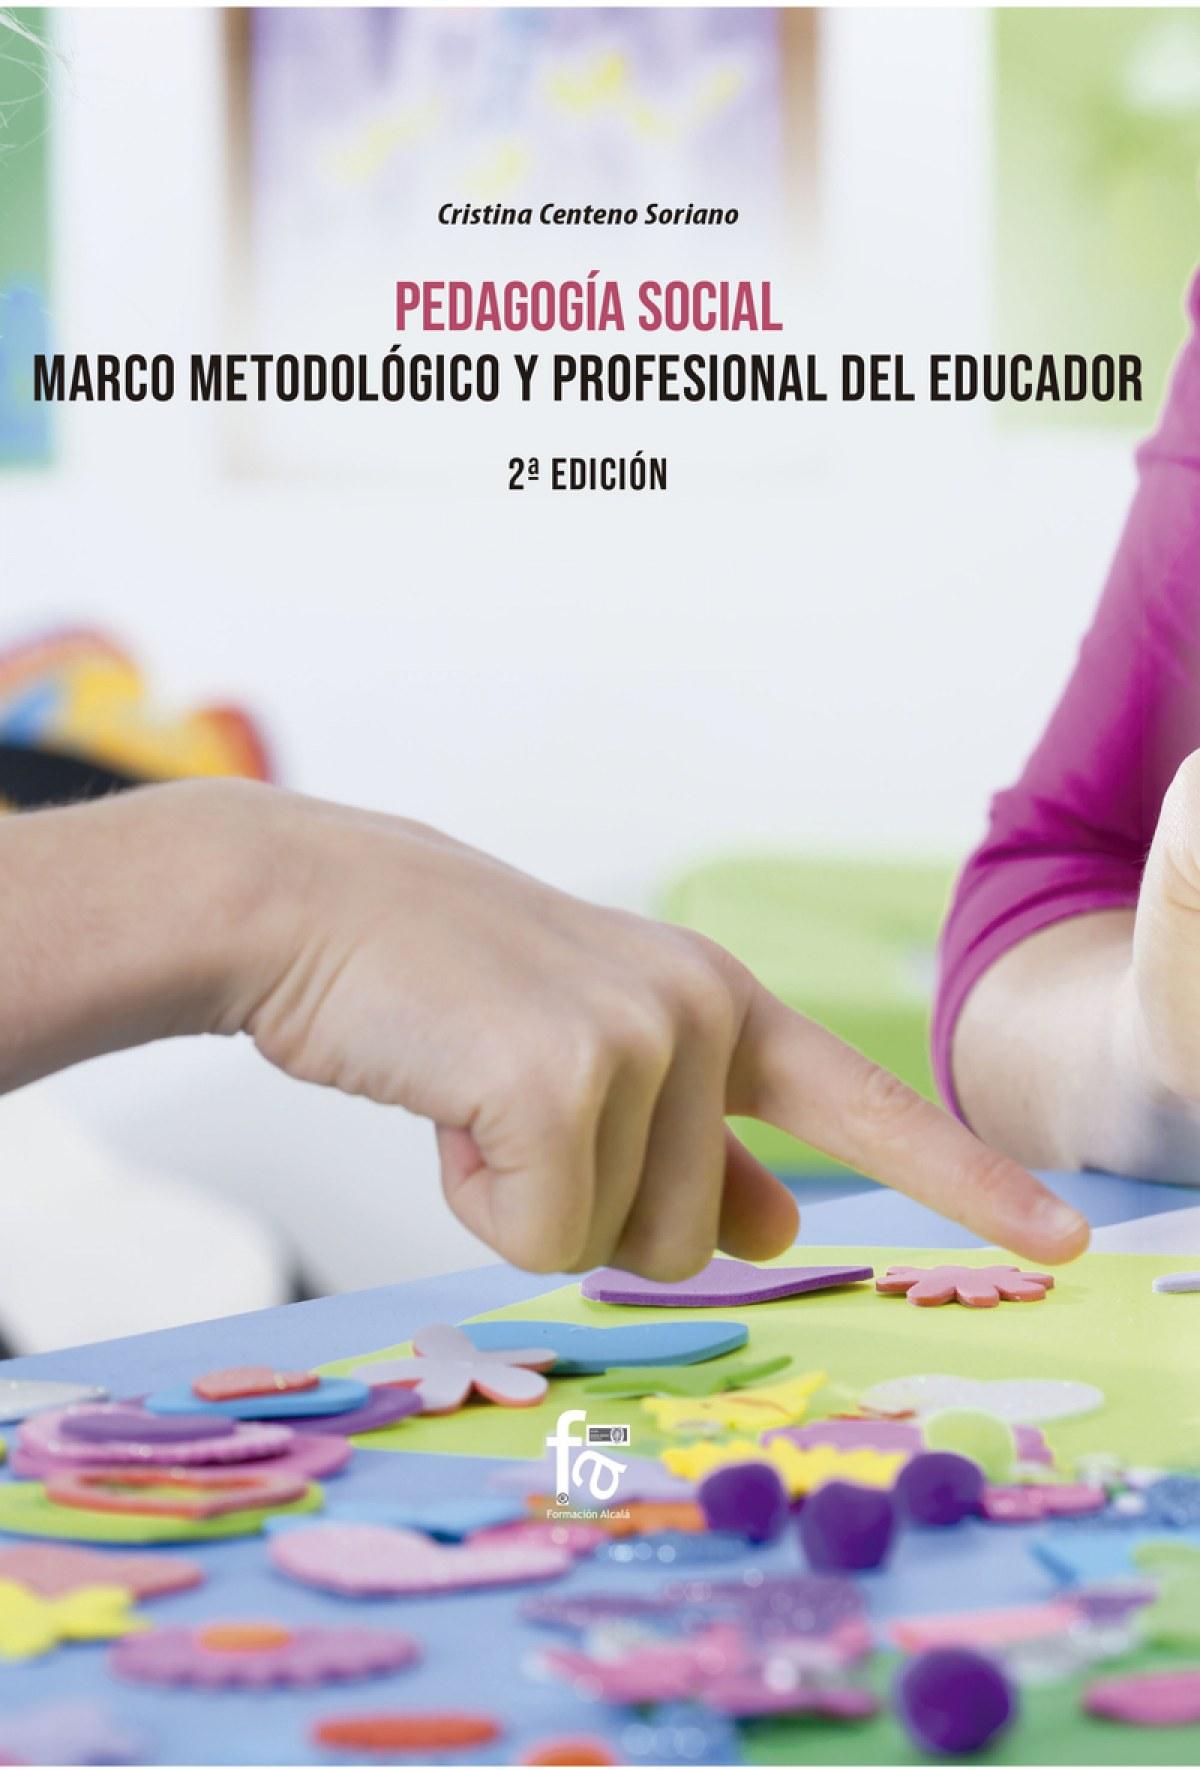 PEDAGOGÃìA SOCIAL.MARCO METODOLÃôGICO Y PROFESIONAL